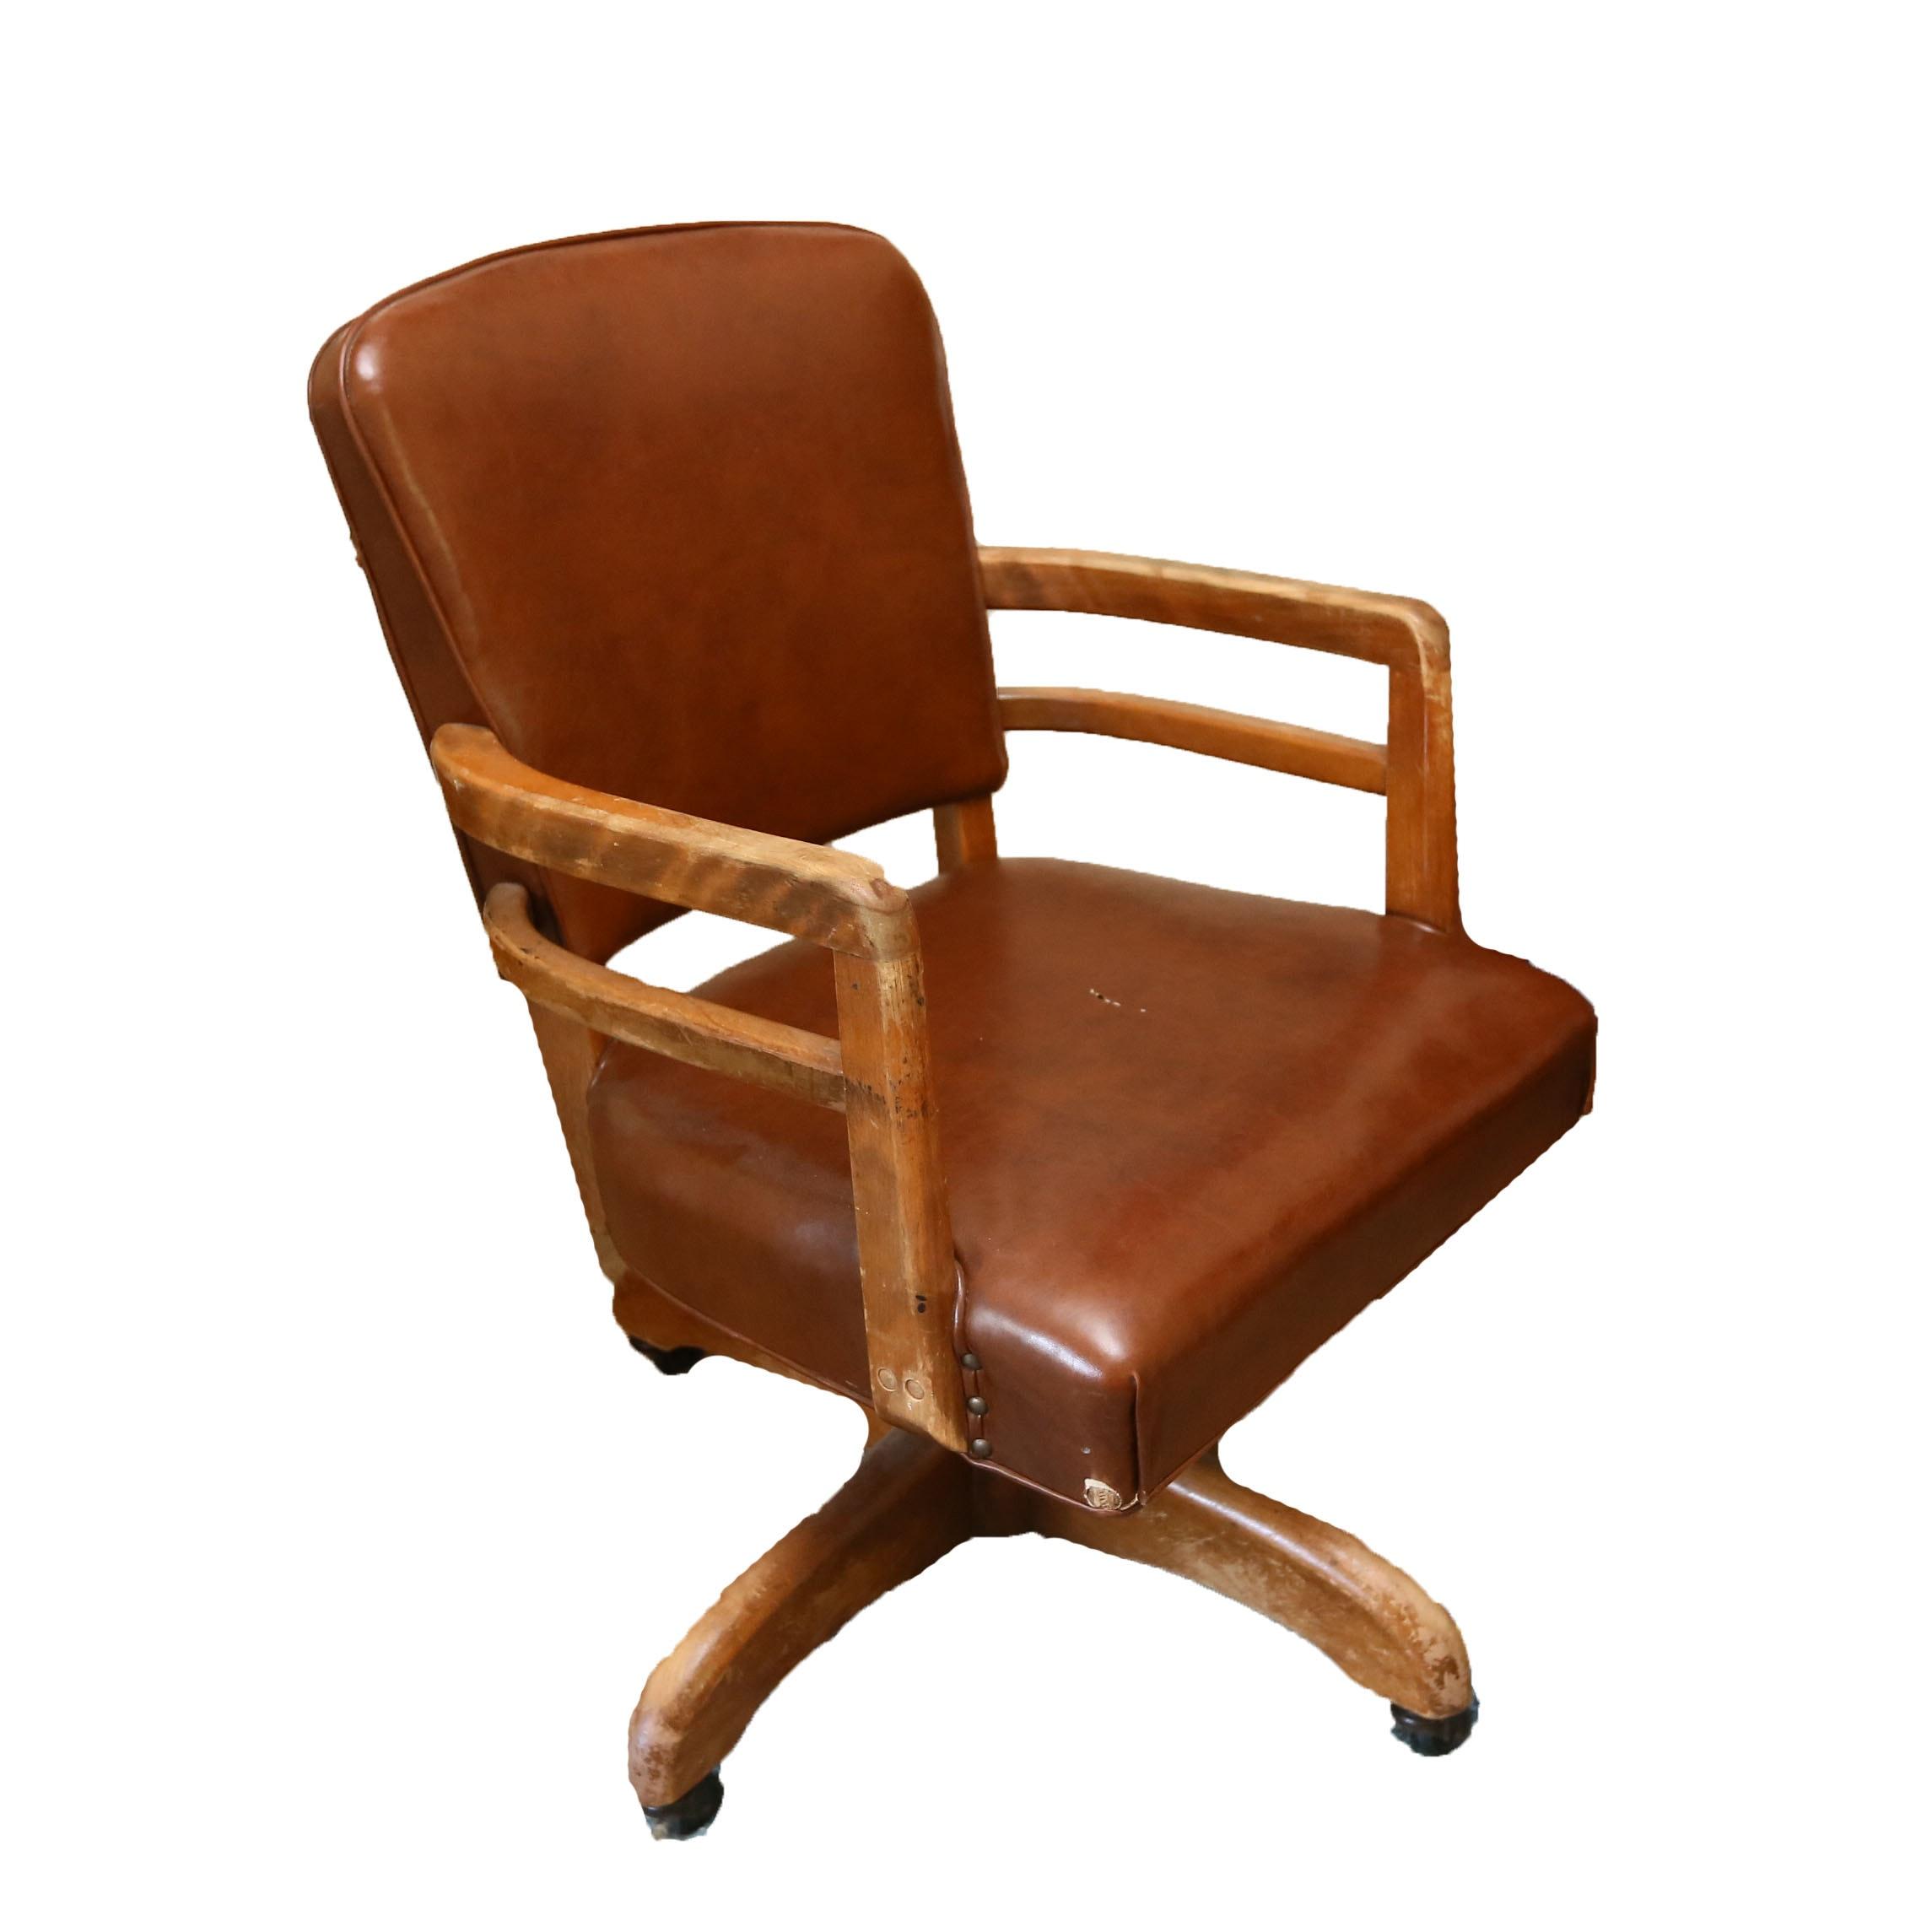 Wooden and Vinyl Desk Chair